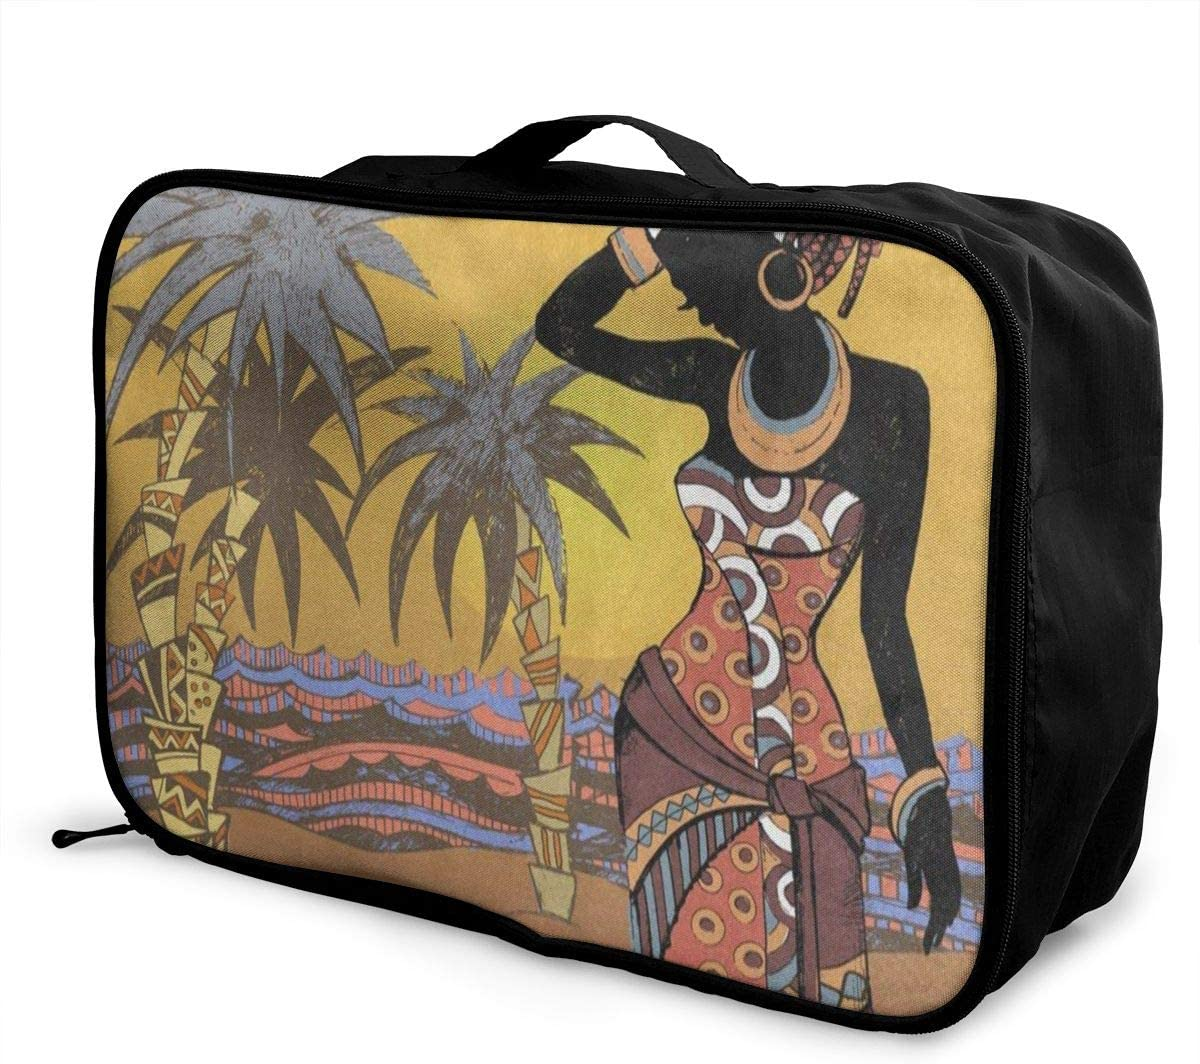 Travel Bags Vintage African Women Palm Tree Portable Handbag Trolley Handle Luggage Bag